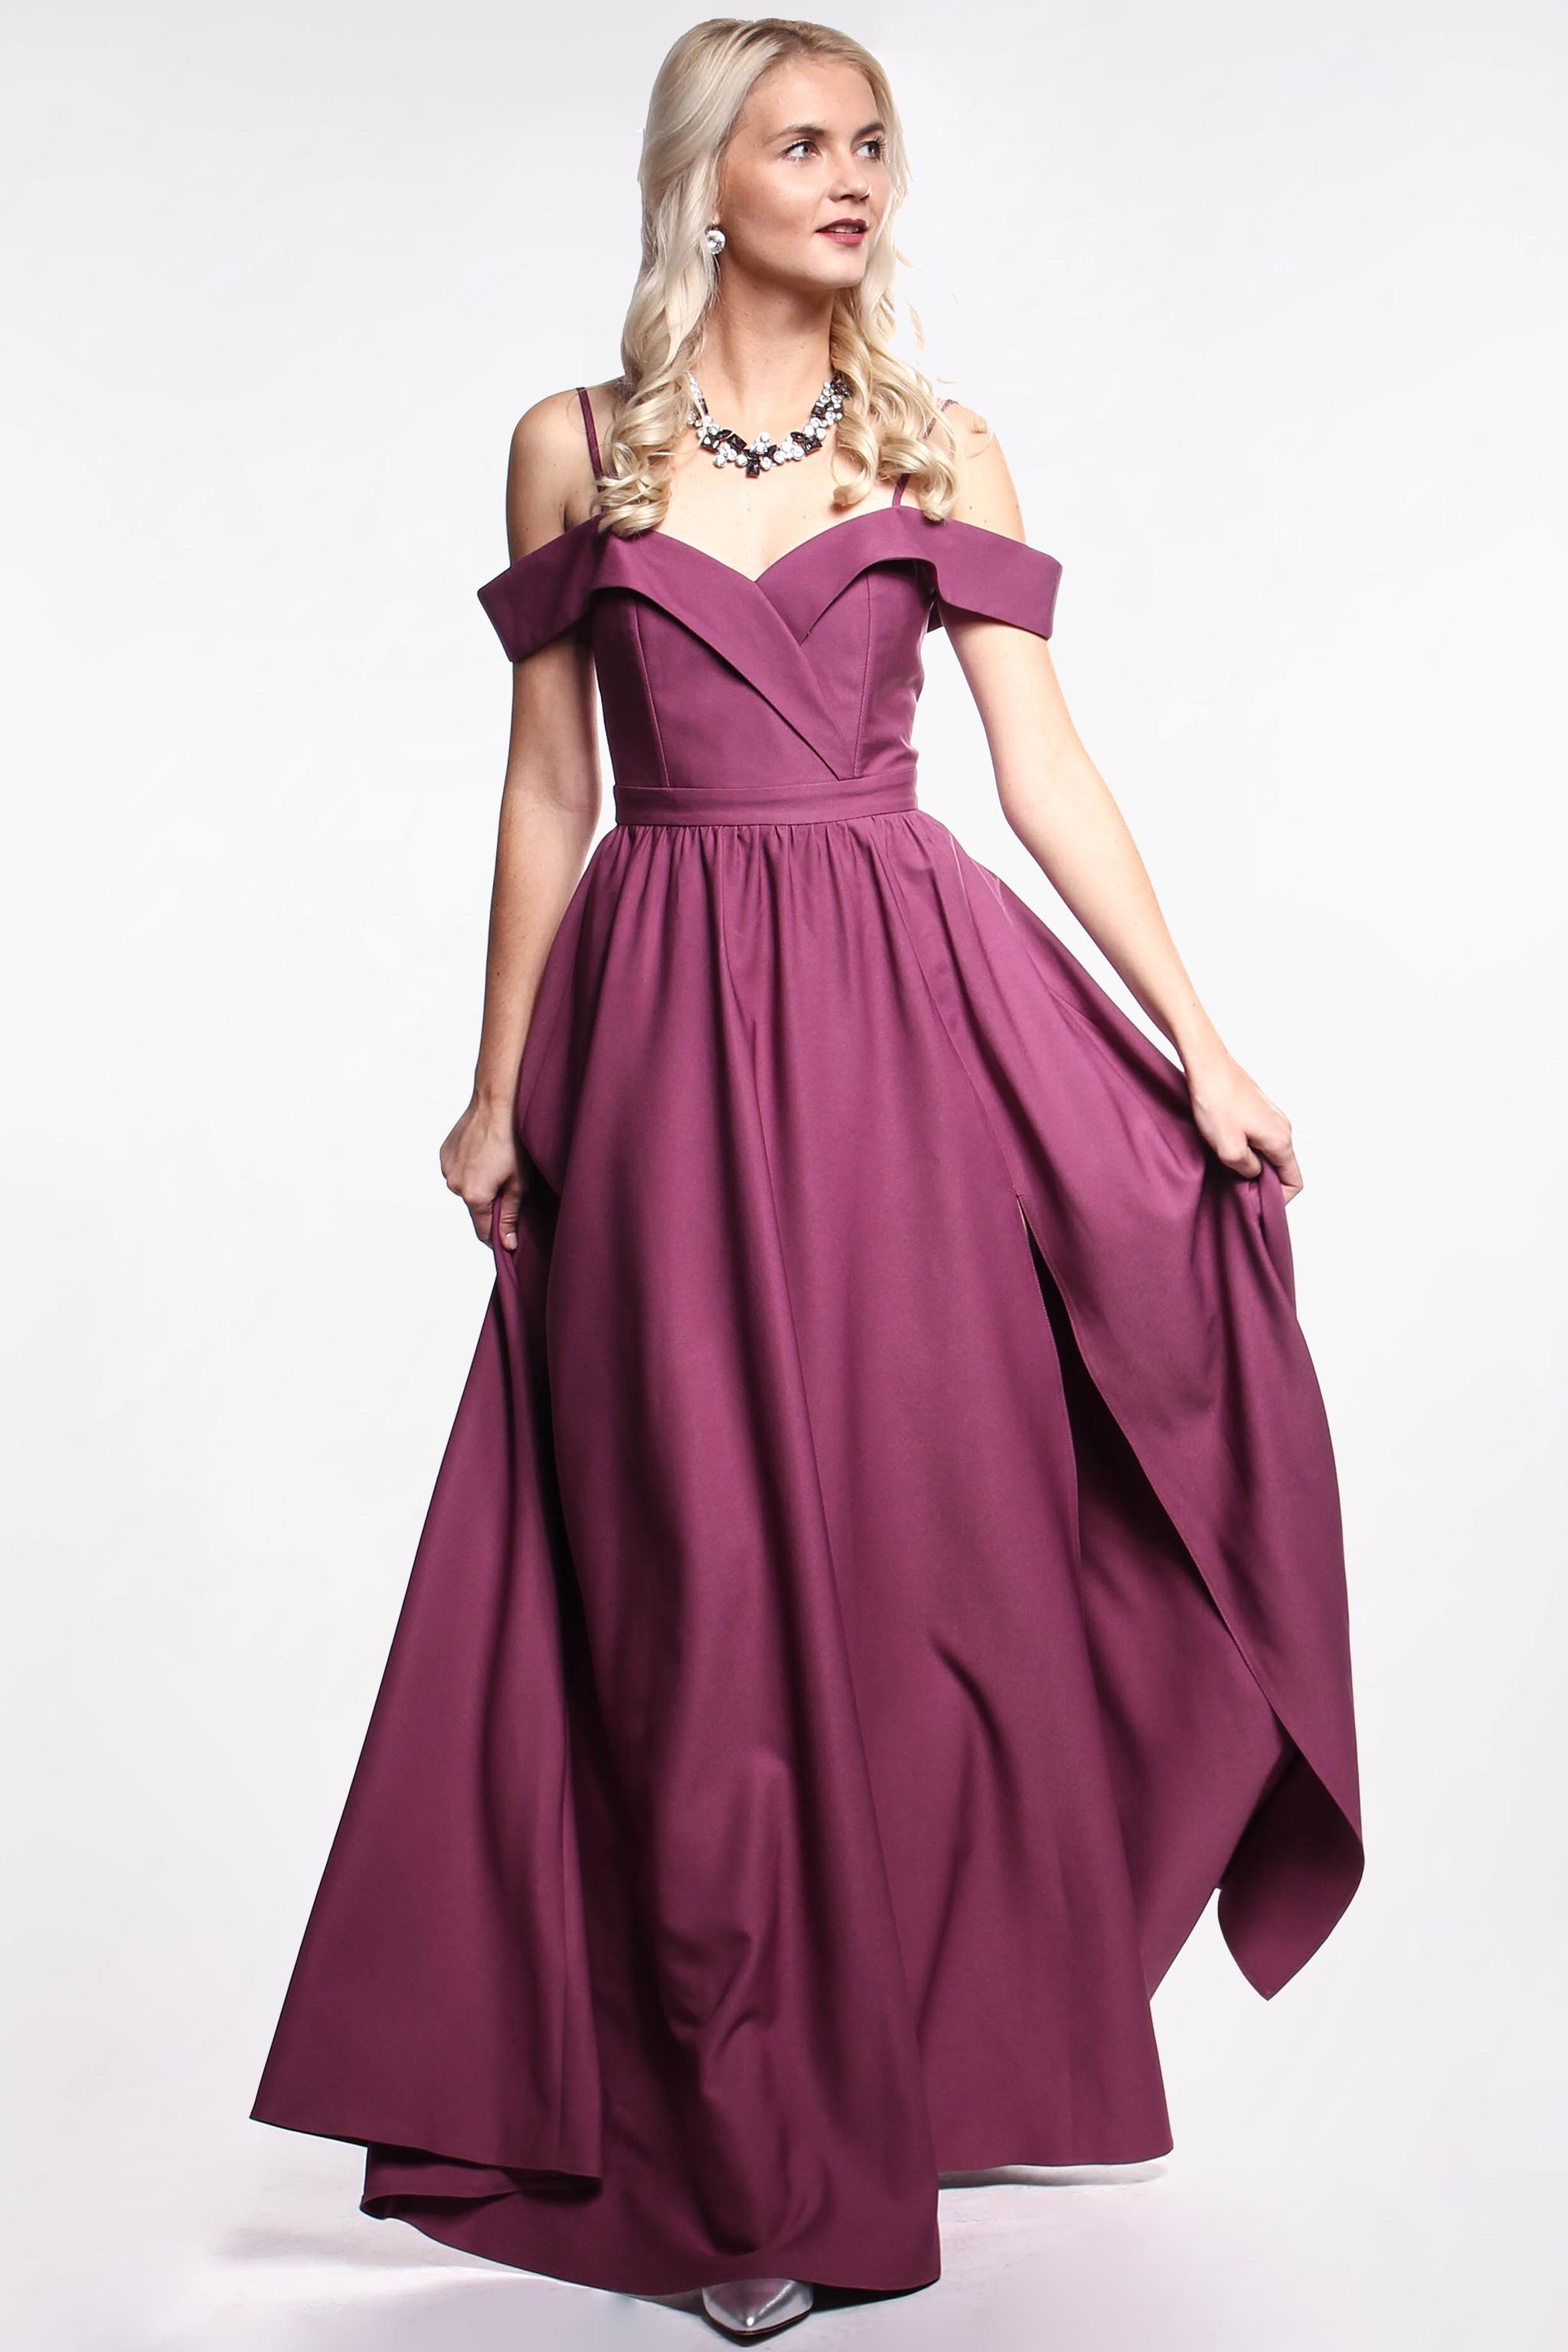 c136dcb02013 Obrázok 1 Fialové plesové šaty